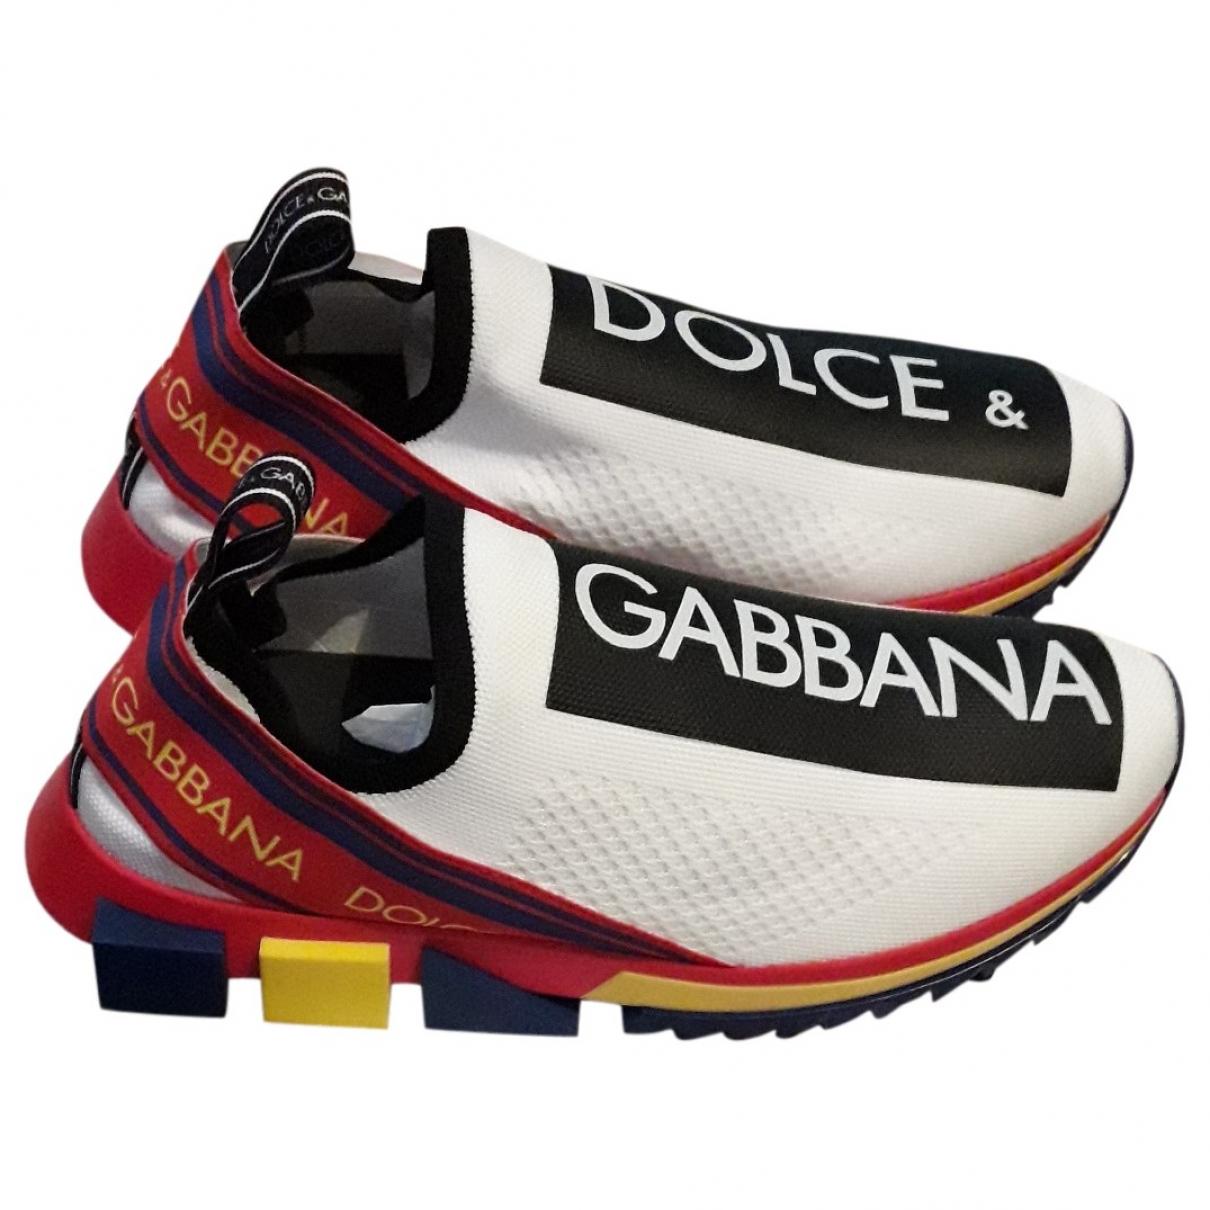 Dolce & Gabbana Sorrento White Cloth Trainers for Men 43 EU